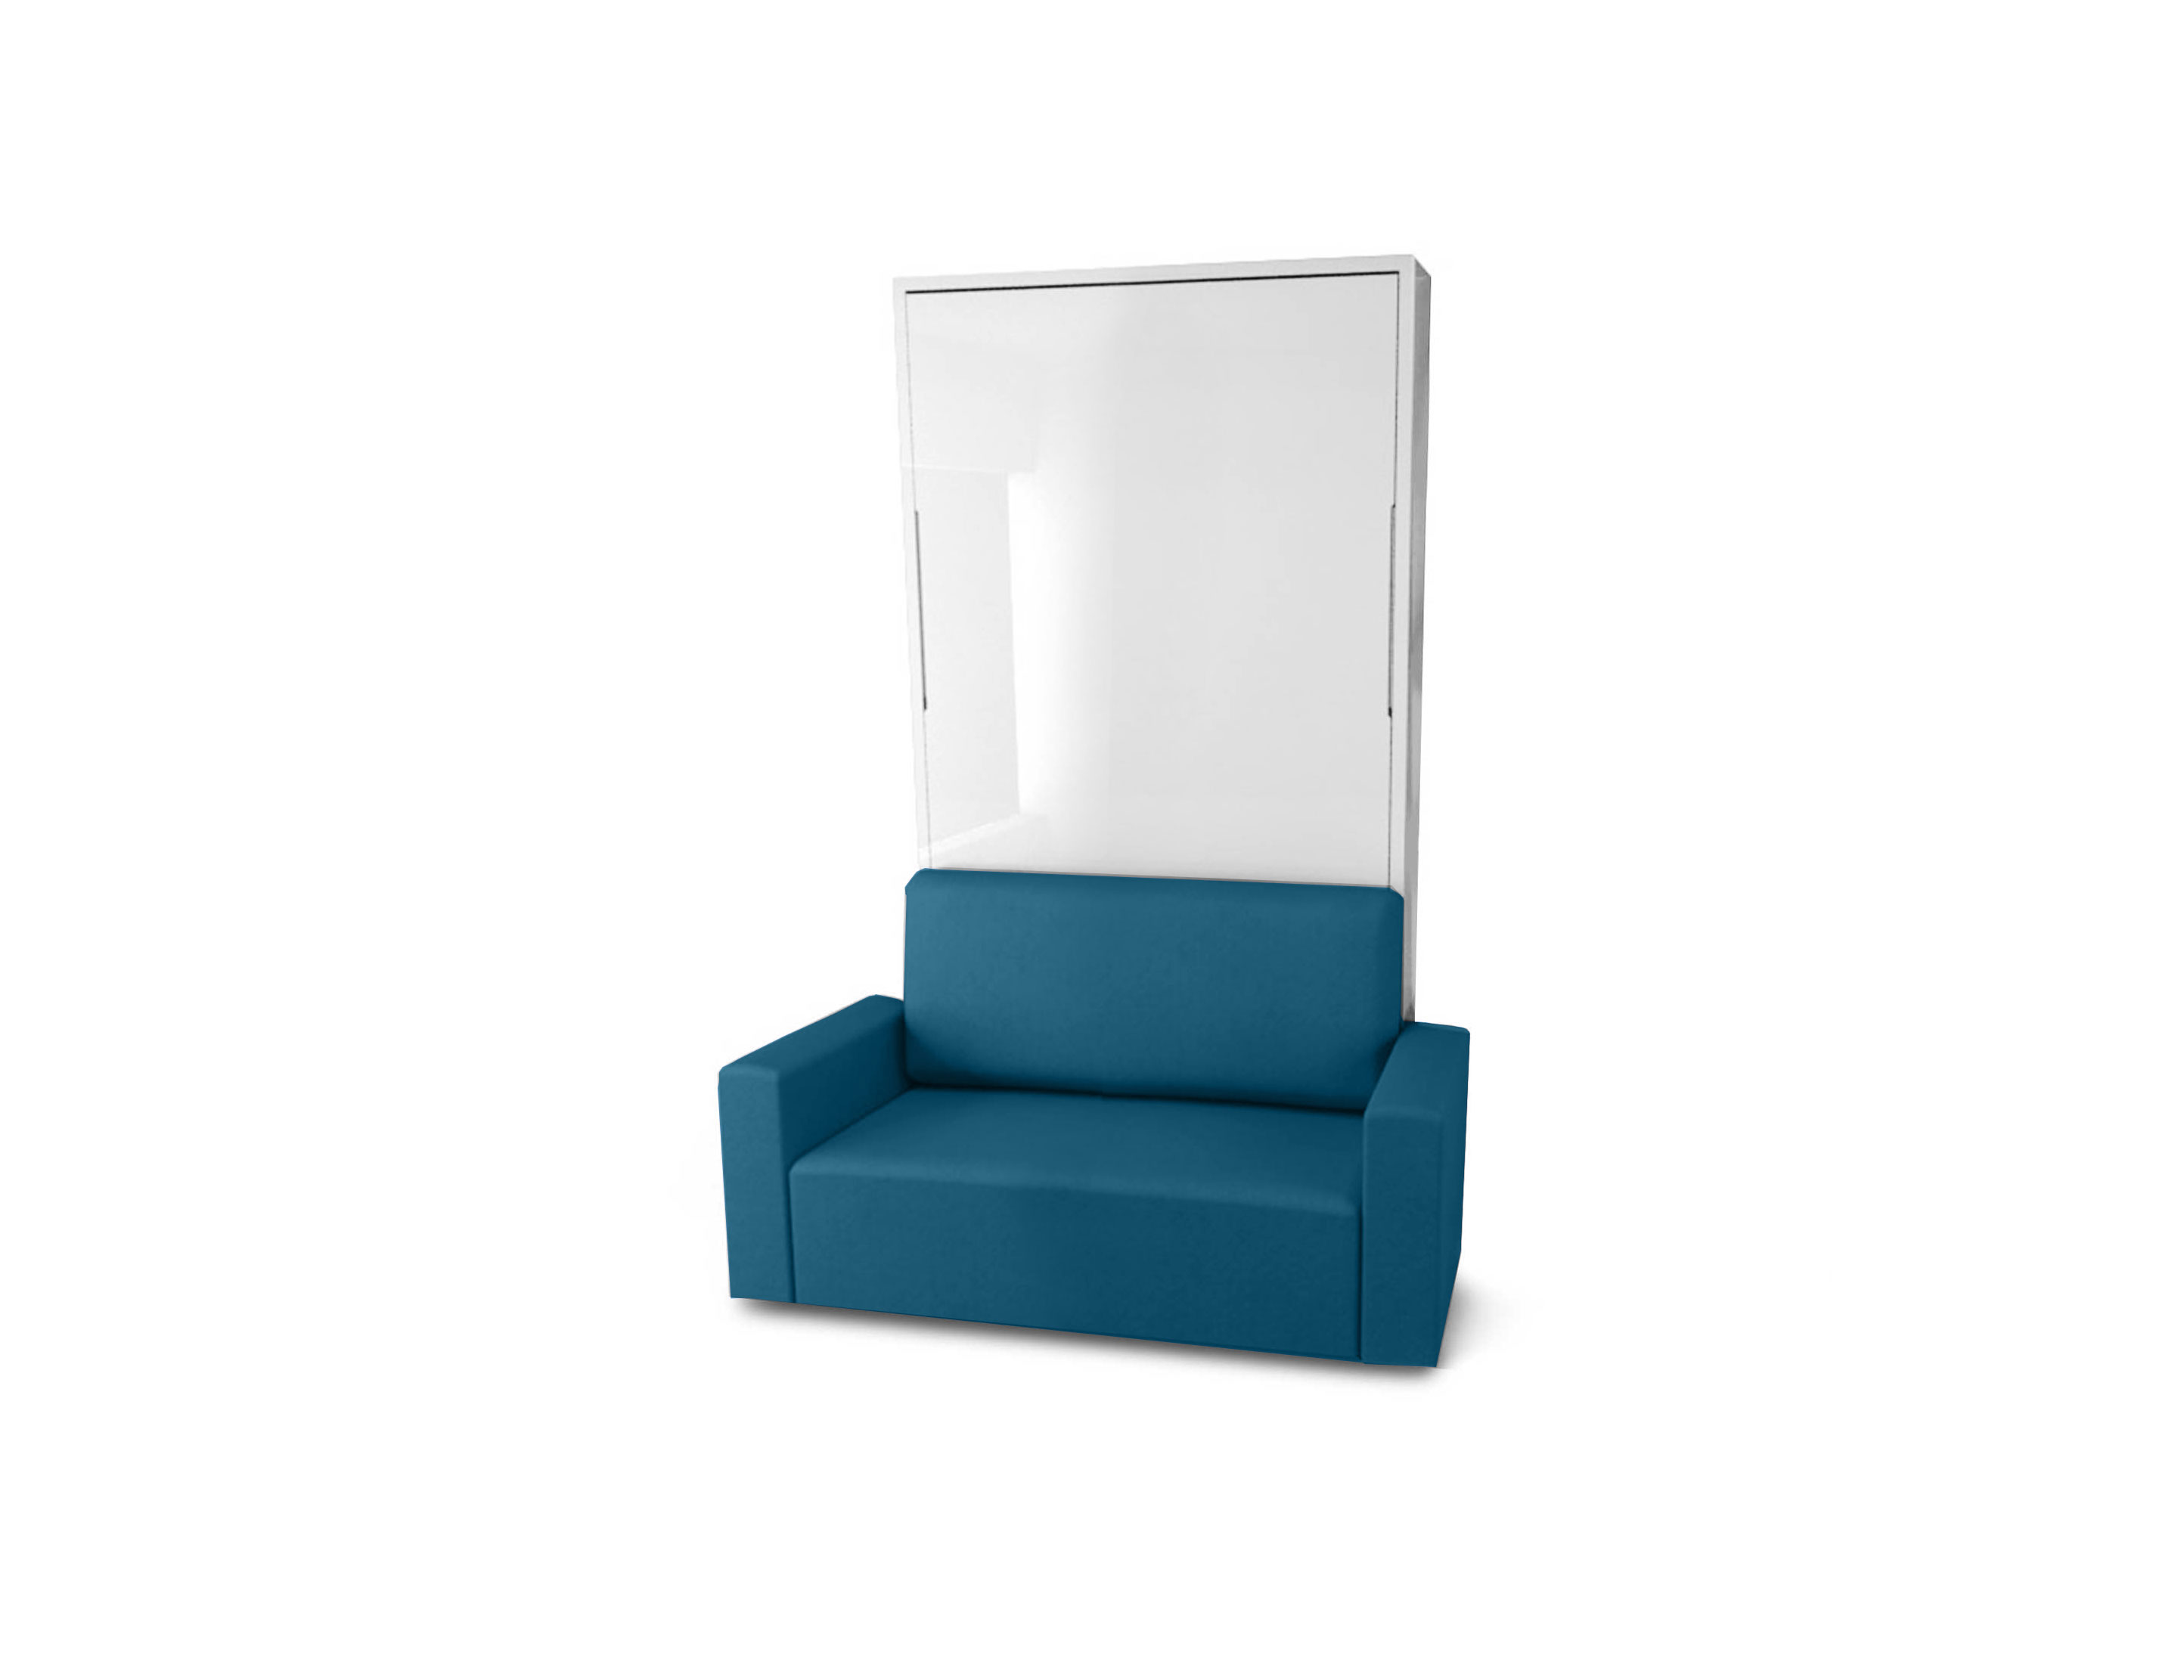 Murphysofa Twin Vertical Wall Bed Sofa Expand Furniture Folding Tables Smarter Wall Beds Space Savers